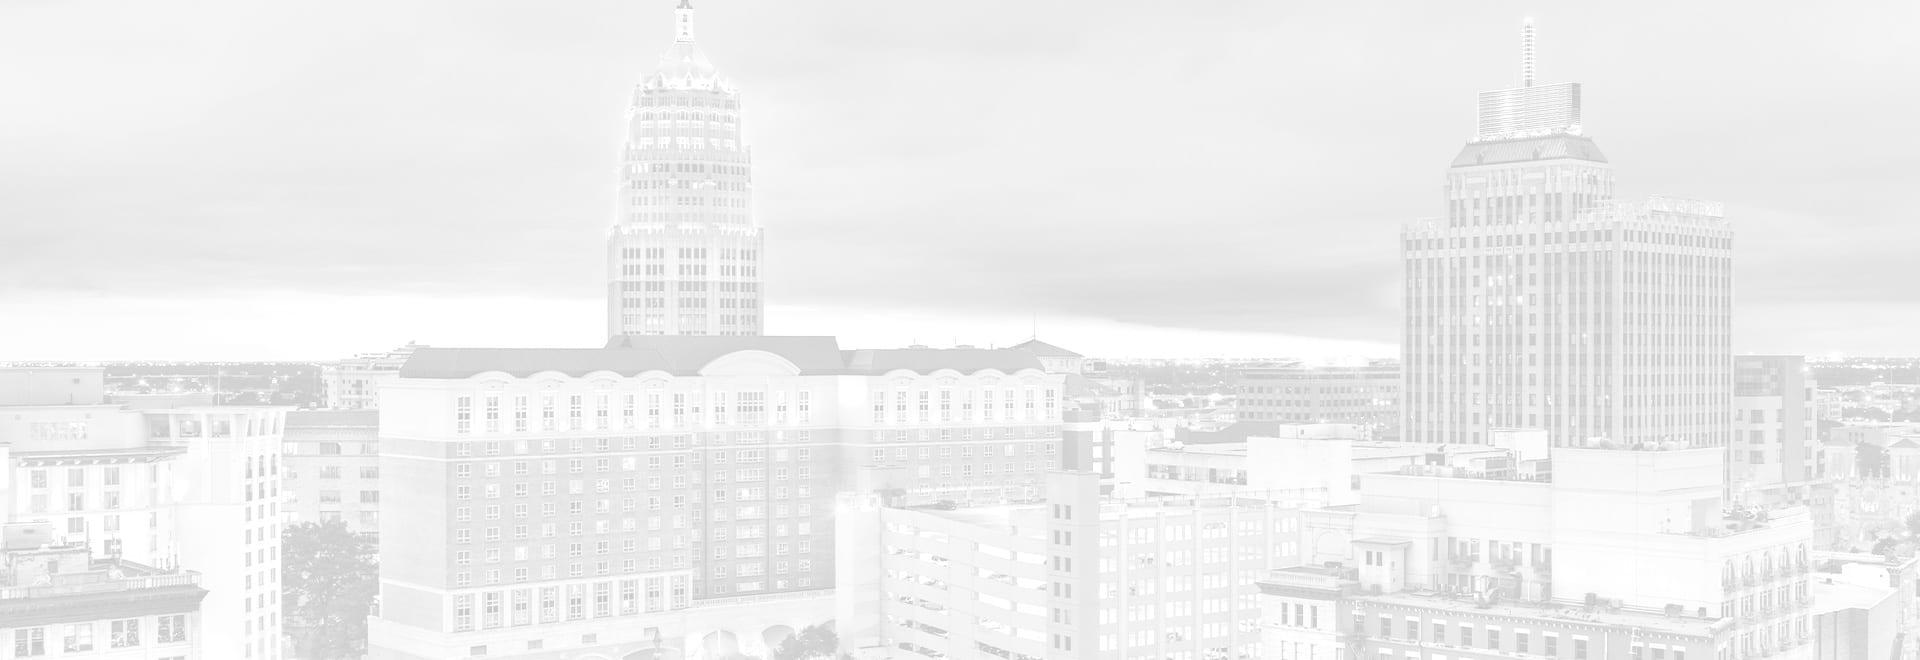 City Skyline with white overlay